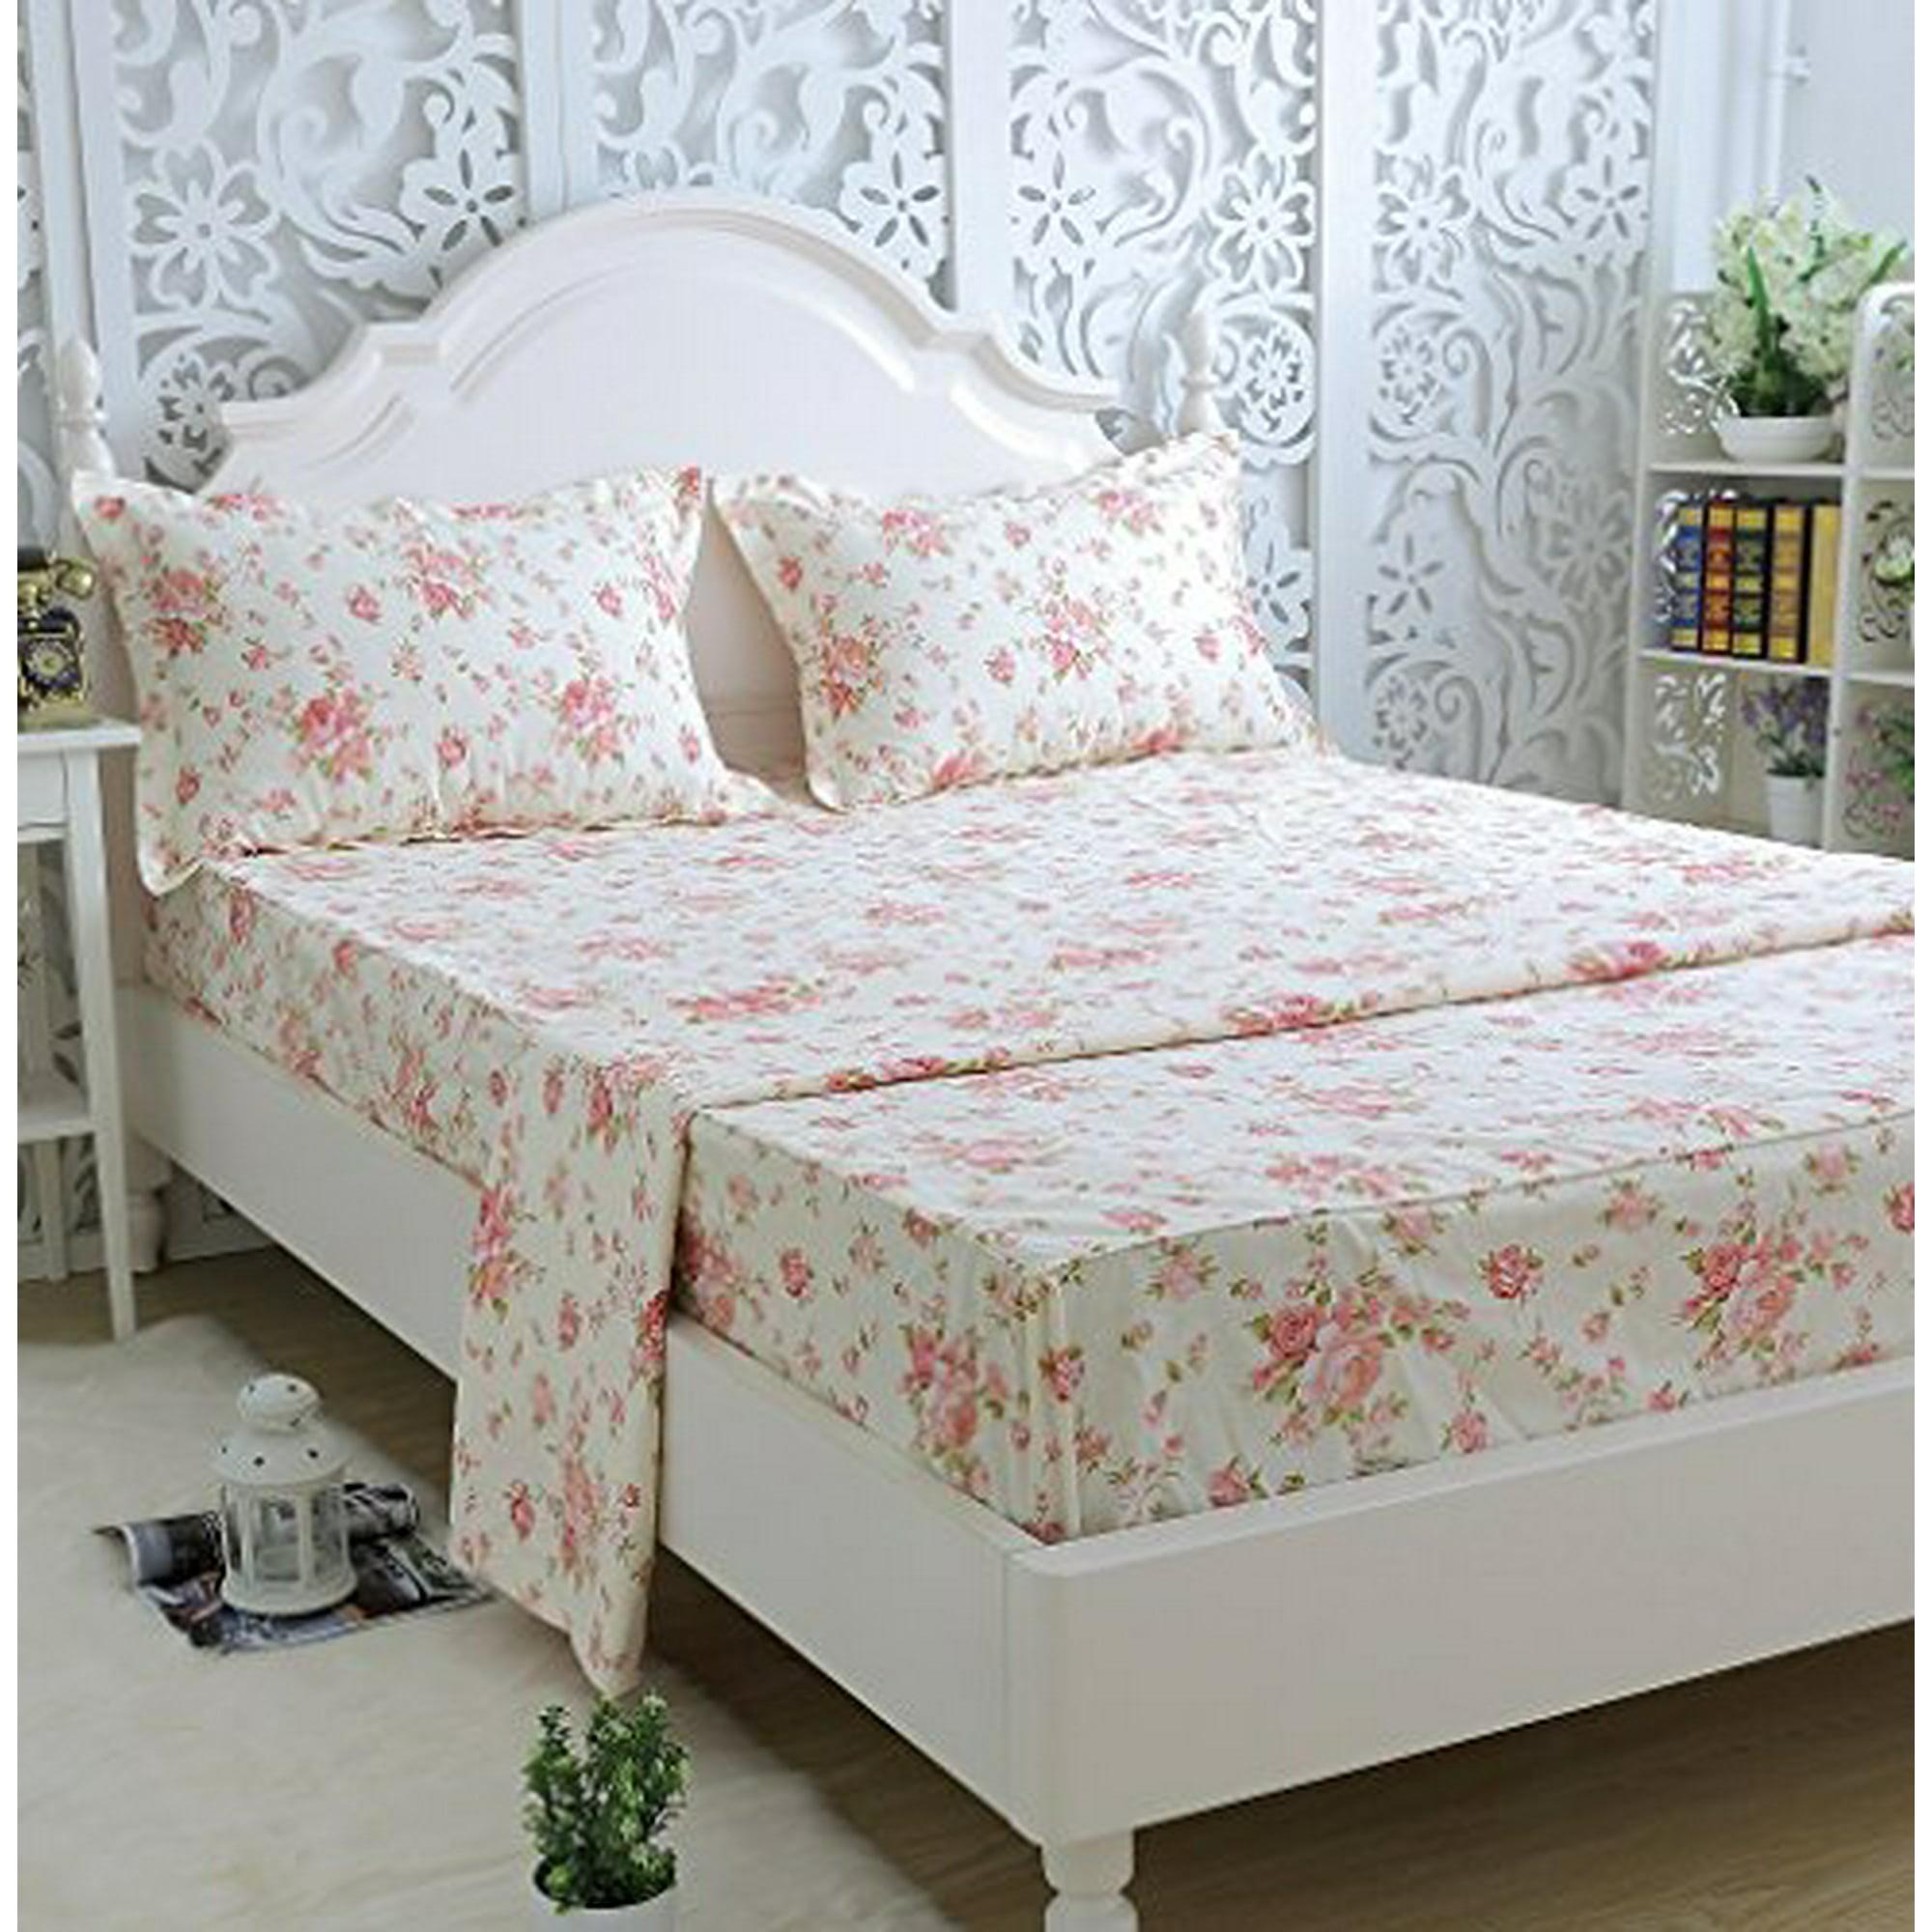 Brandream Full Size Sheets Cotton Farmhouse Bedding Sets Shabby Floral Bed Sheet Set Deep Pockets 18 Inch Walmart Canada